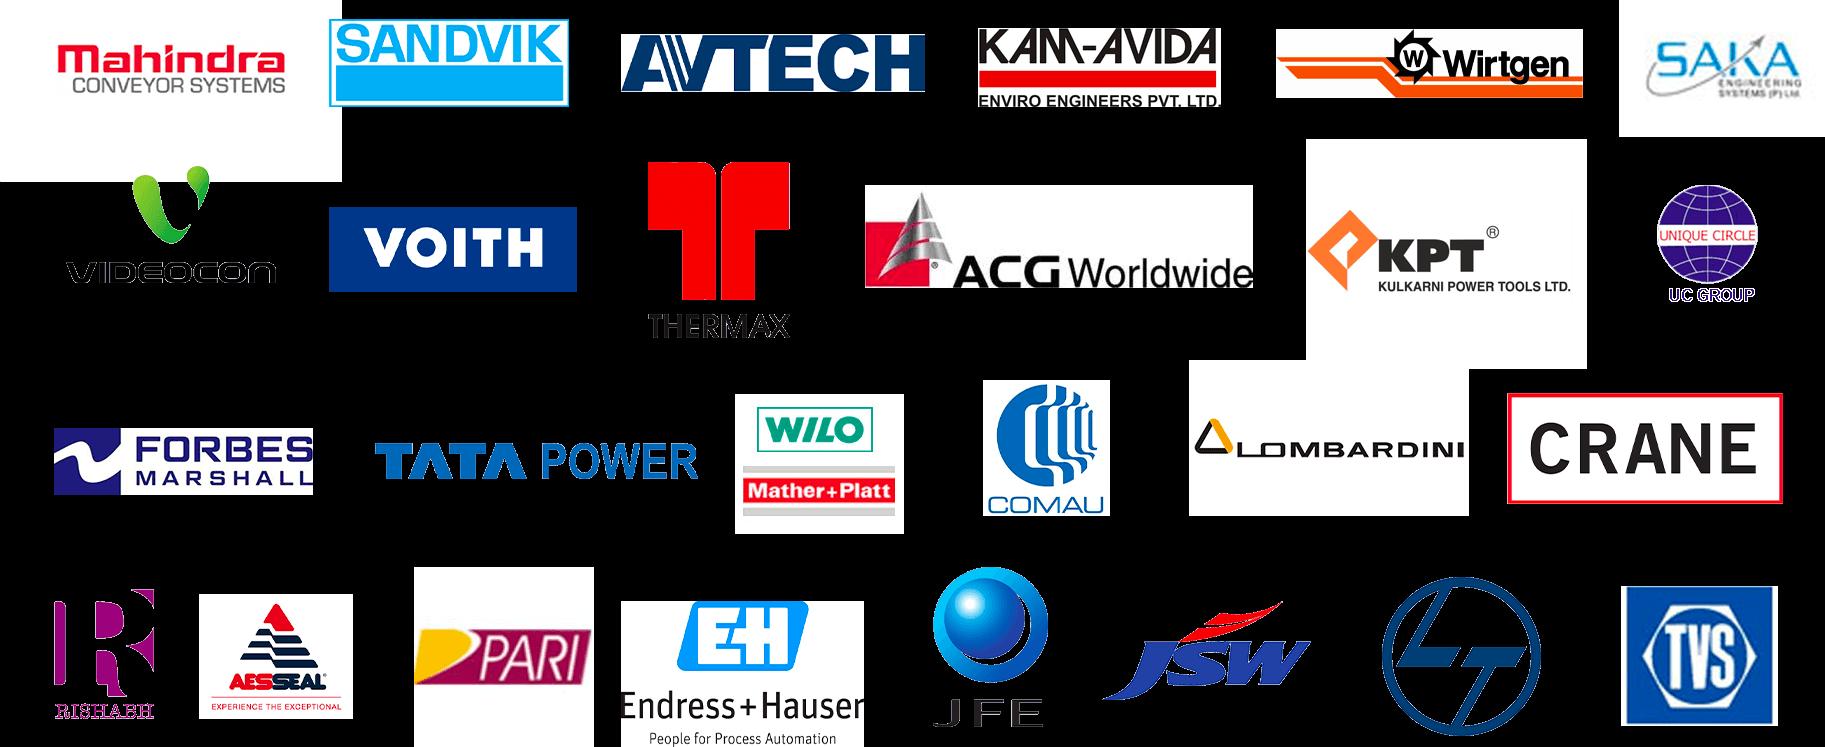 Siemens Channel Partner-3D Engineering -Manufacturing